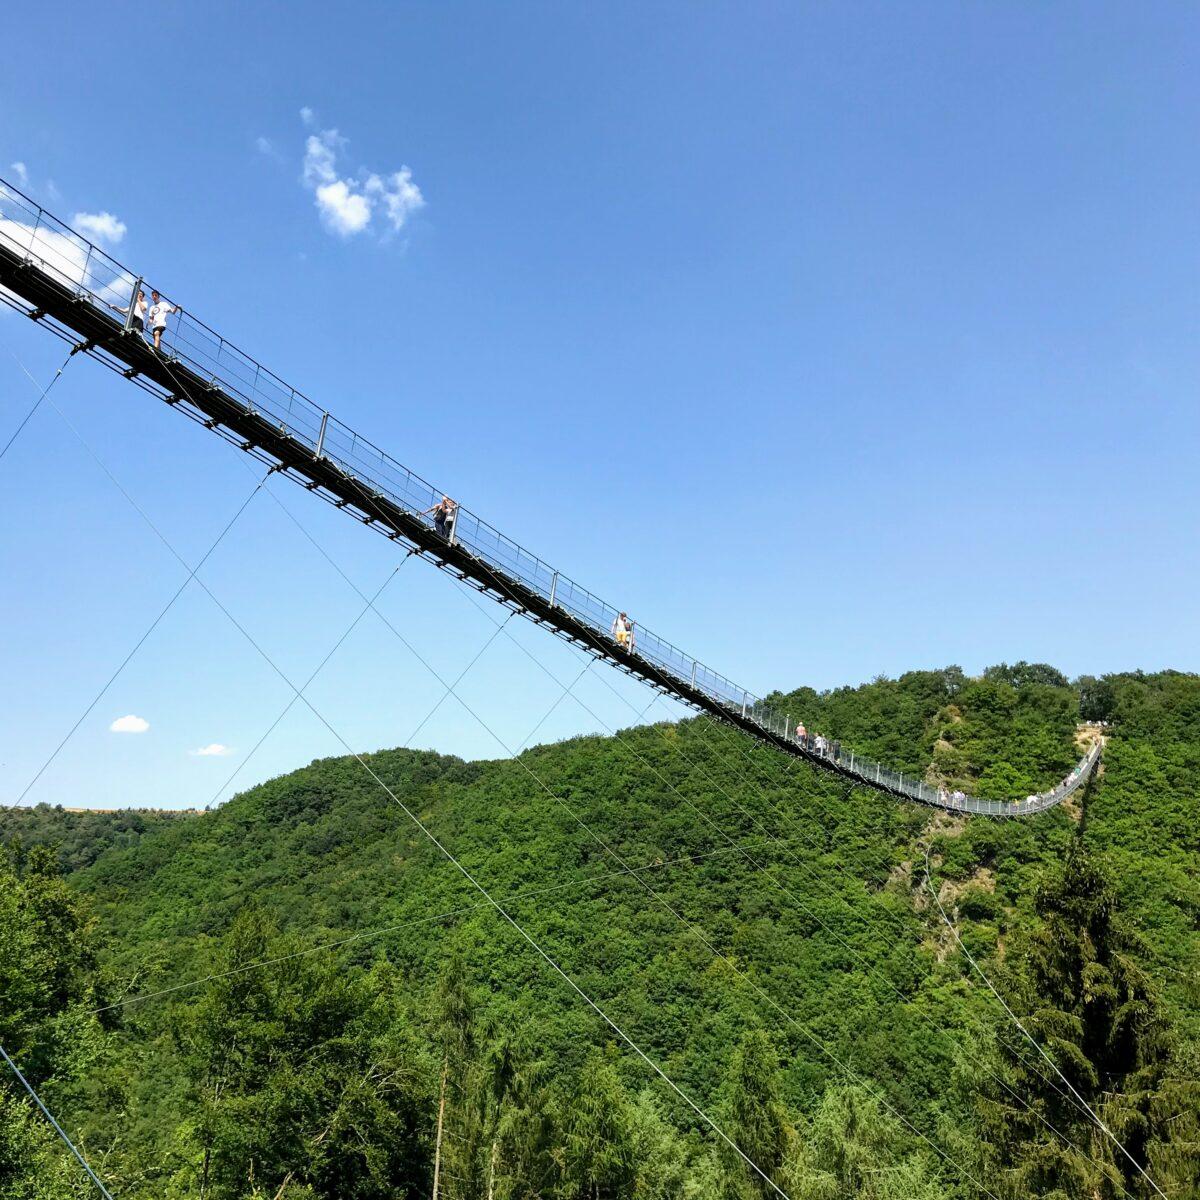 Themareizen - hangbruggen